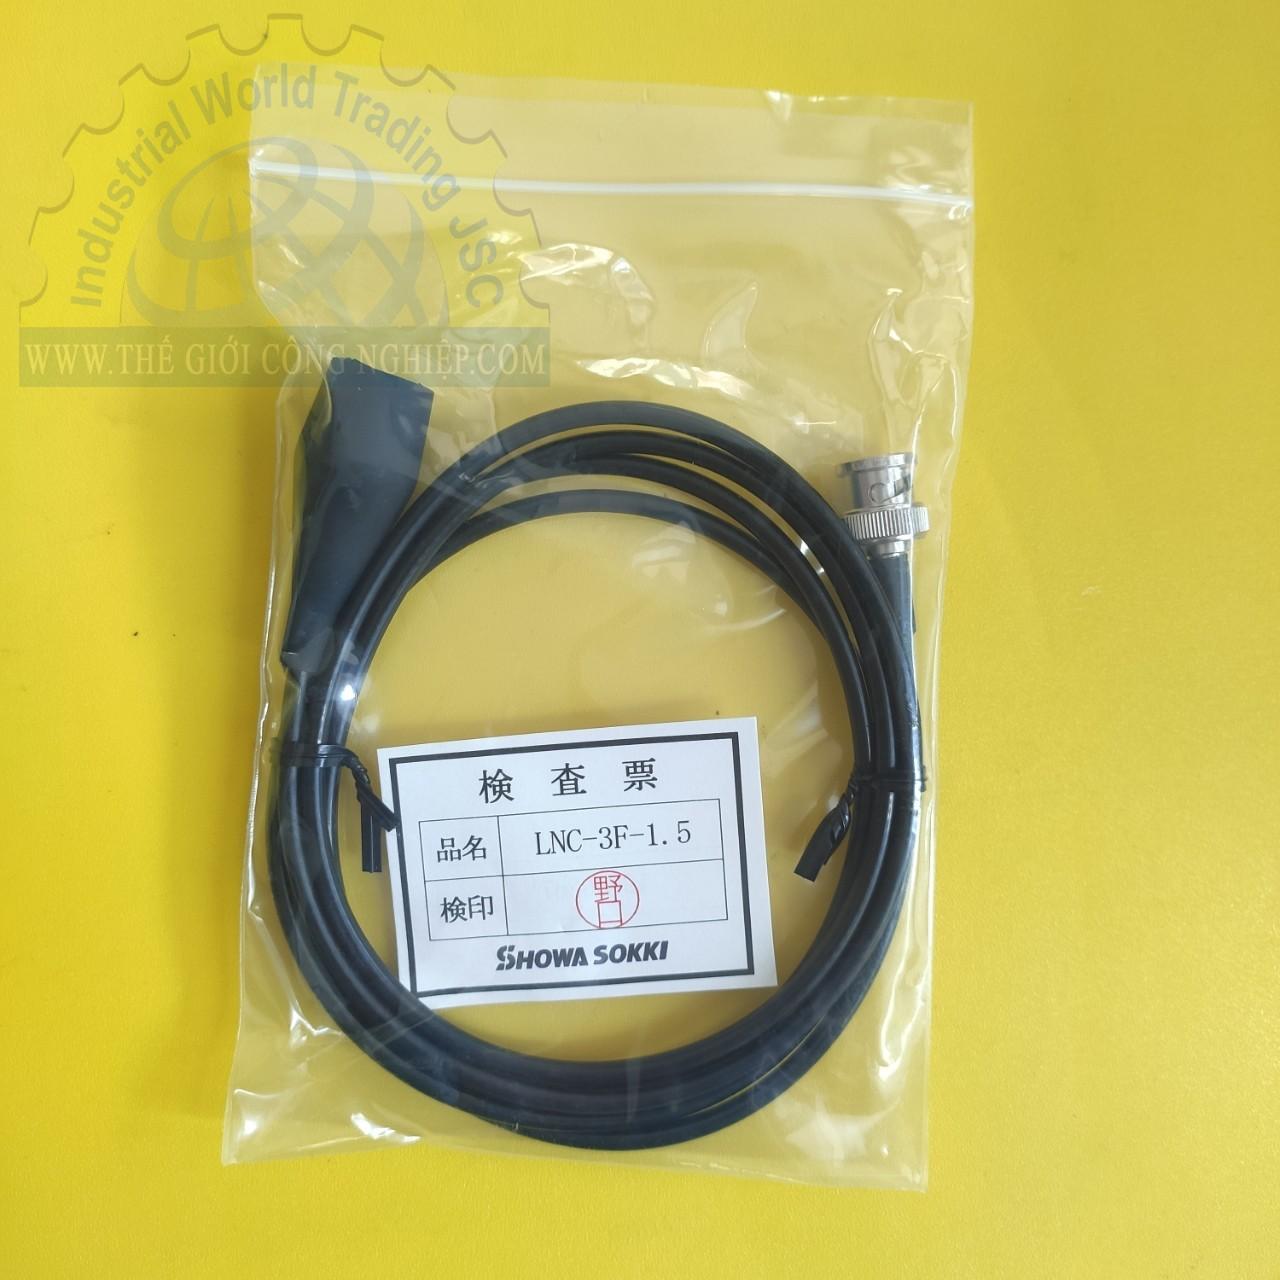 Cable for Vibration Meter LNC-3F-1.5 Showa-Sokki